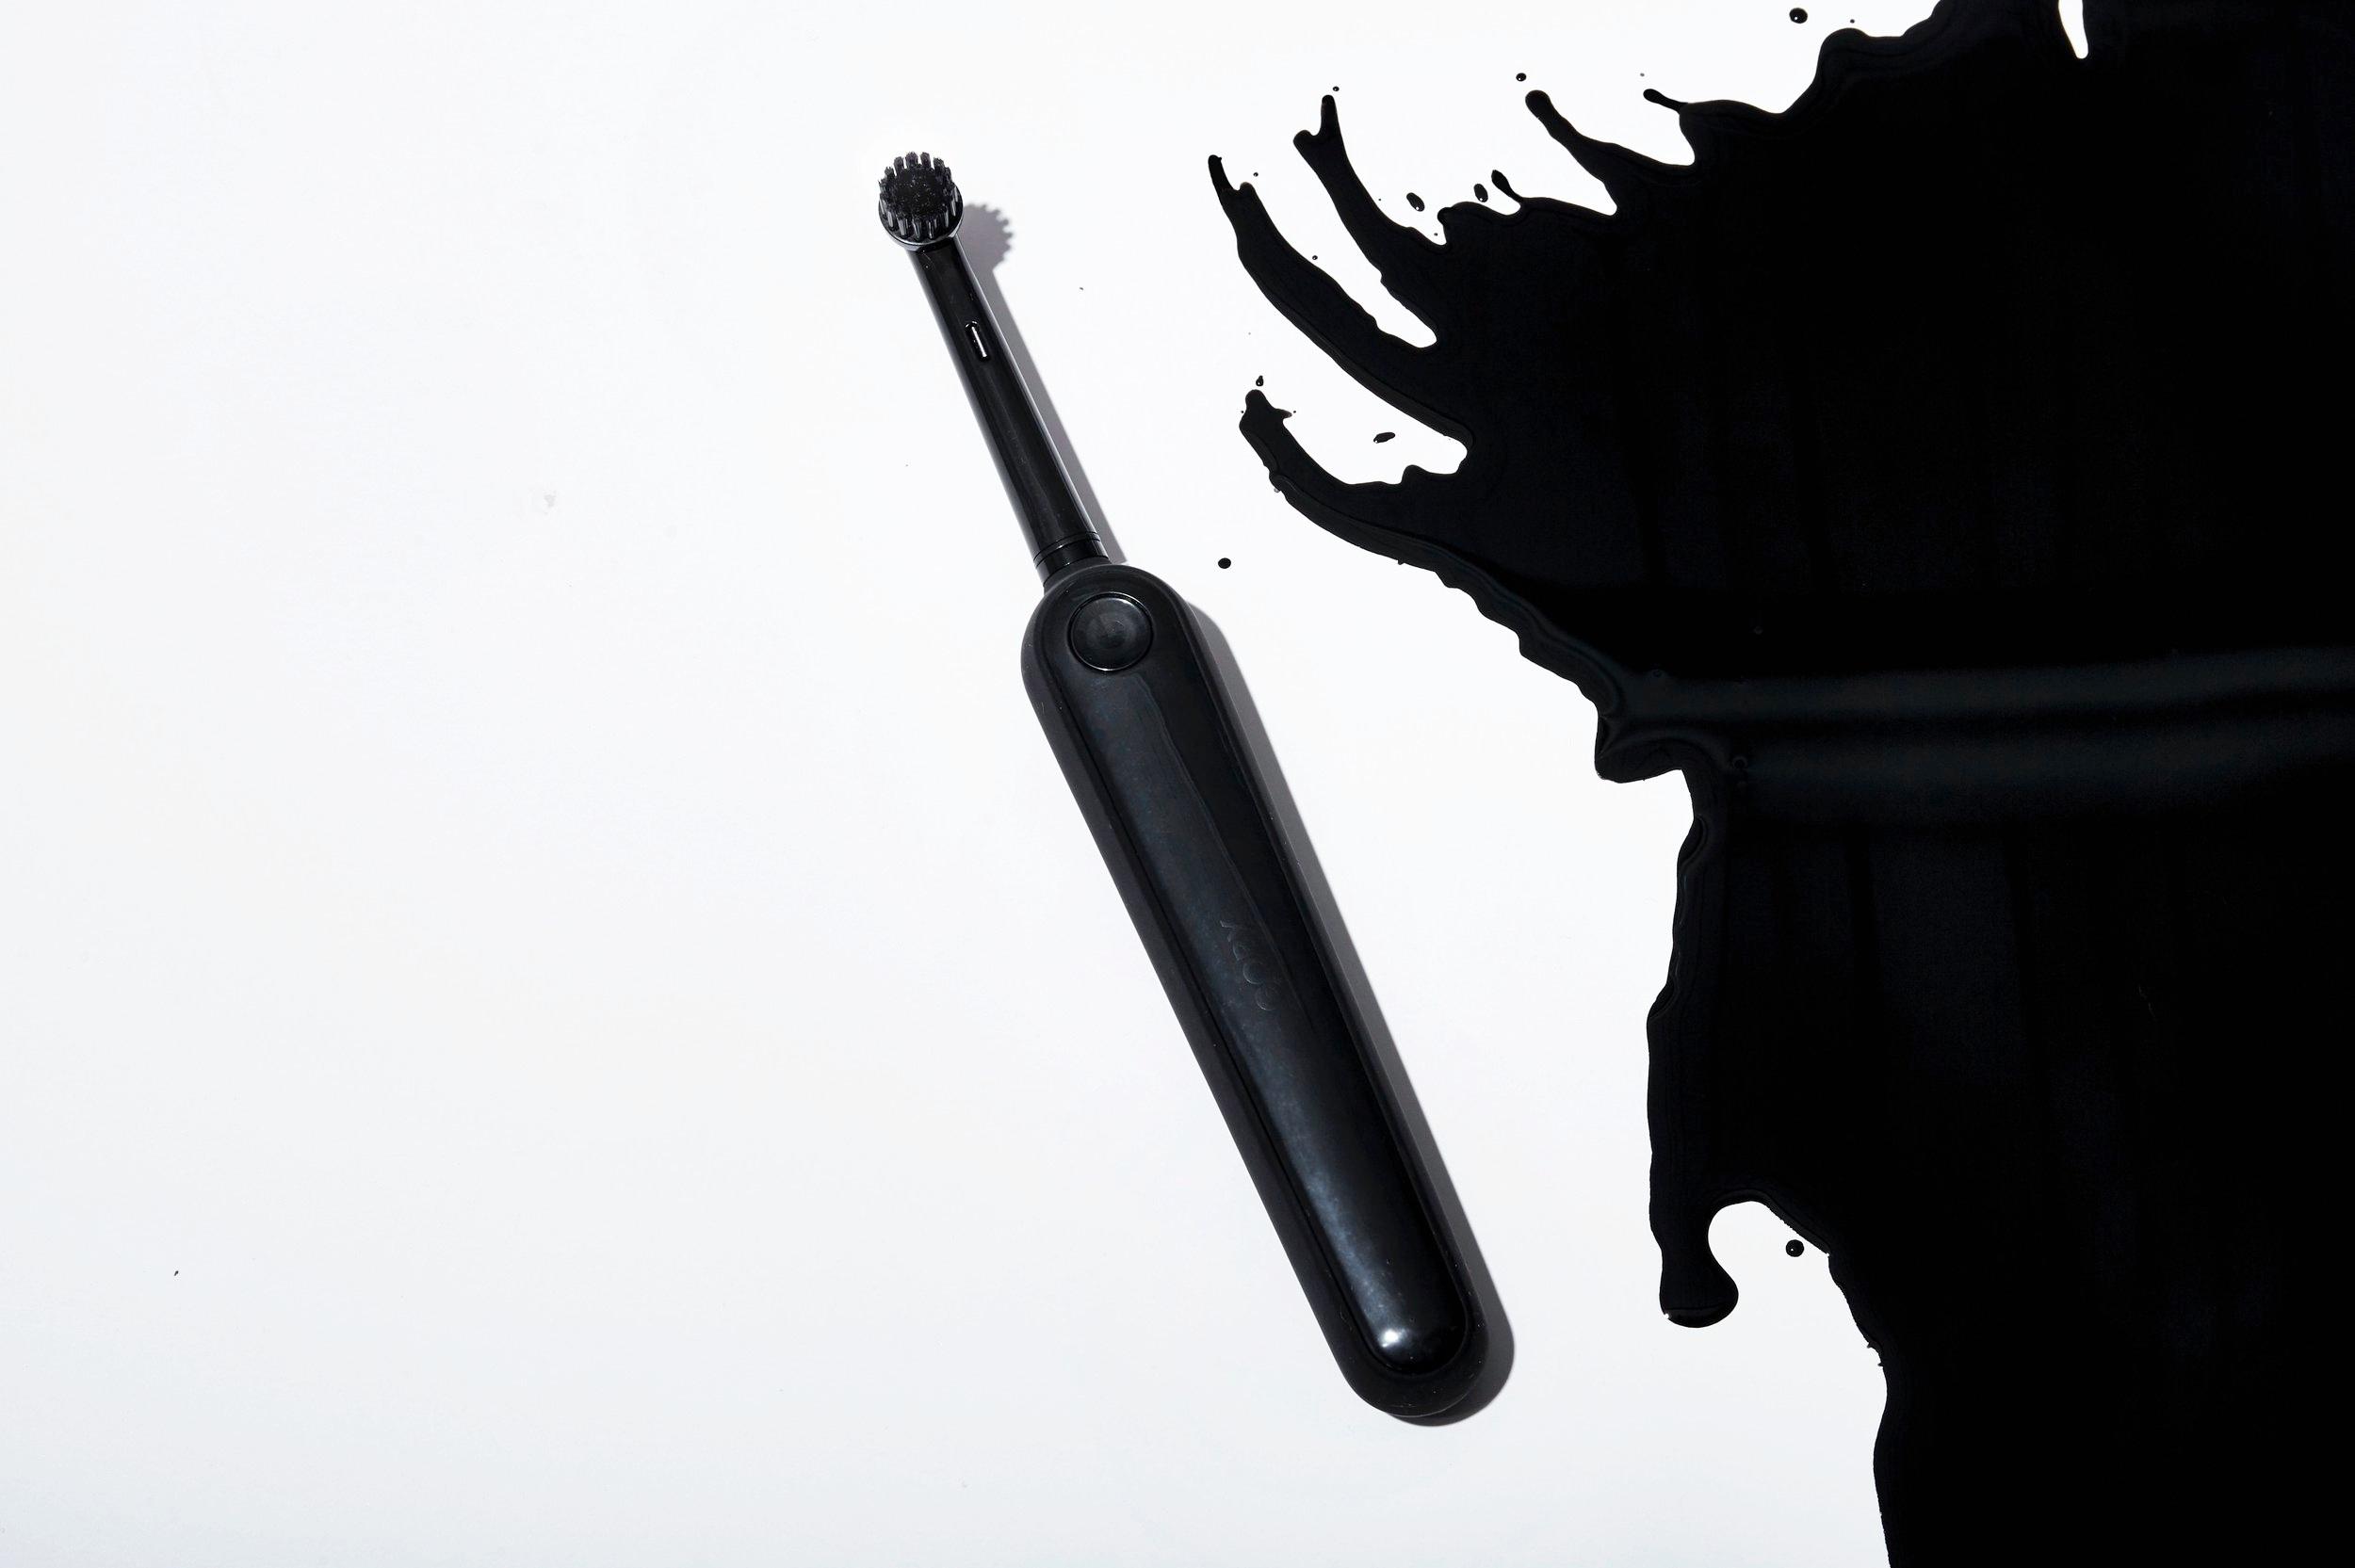 goby-all-black2.jpg